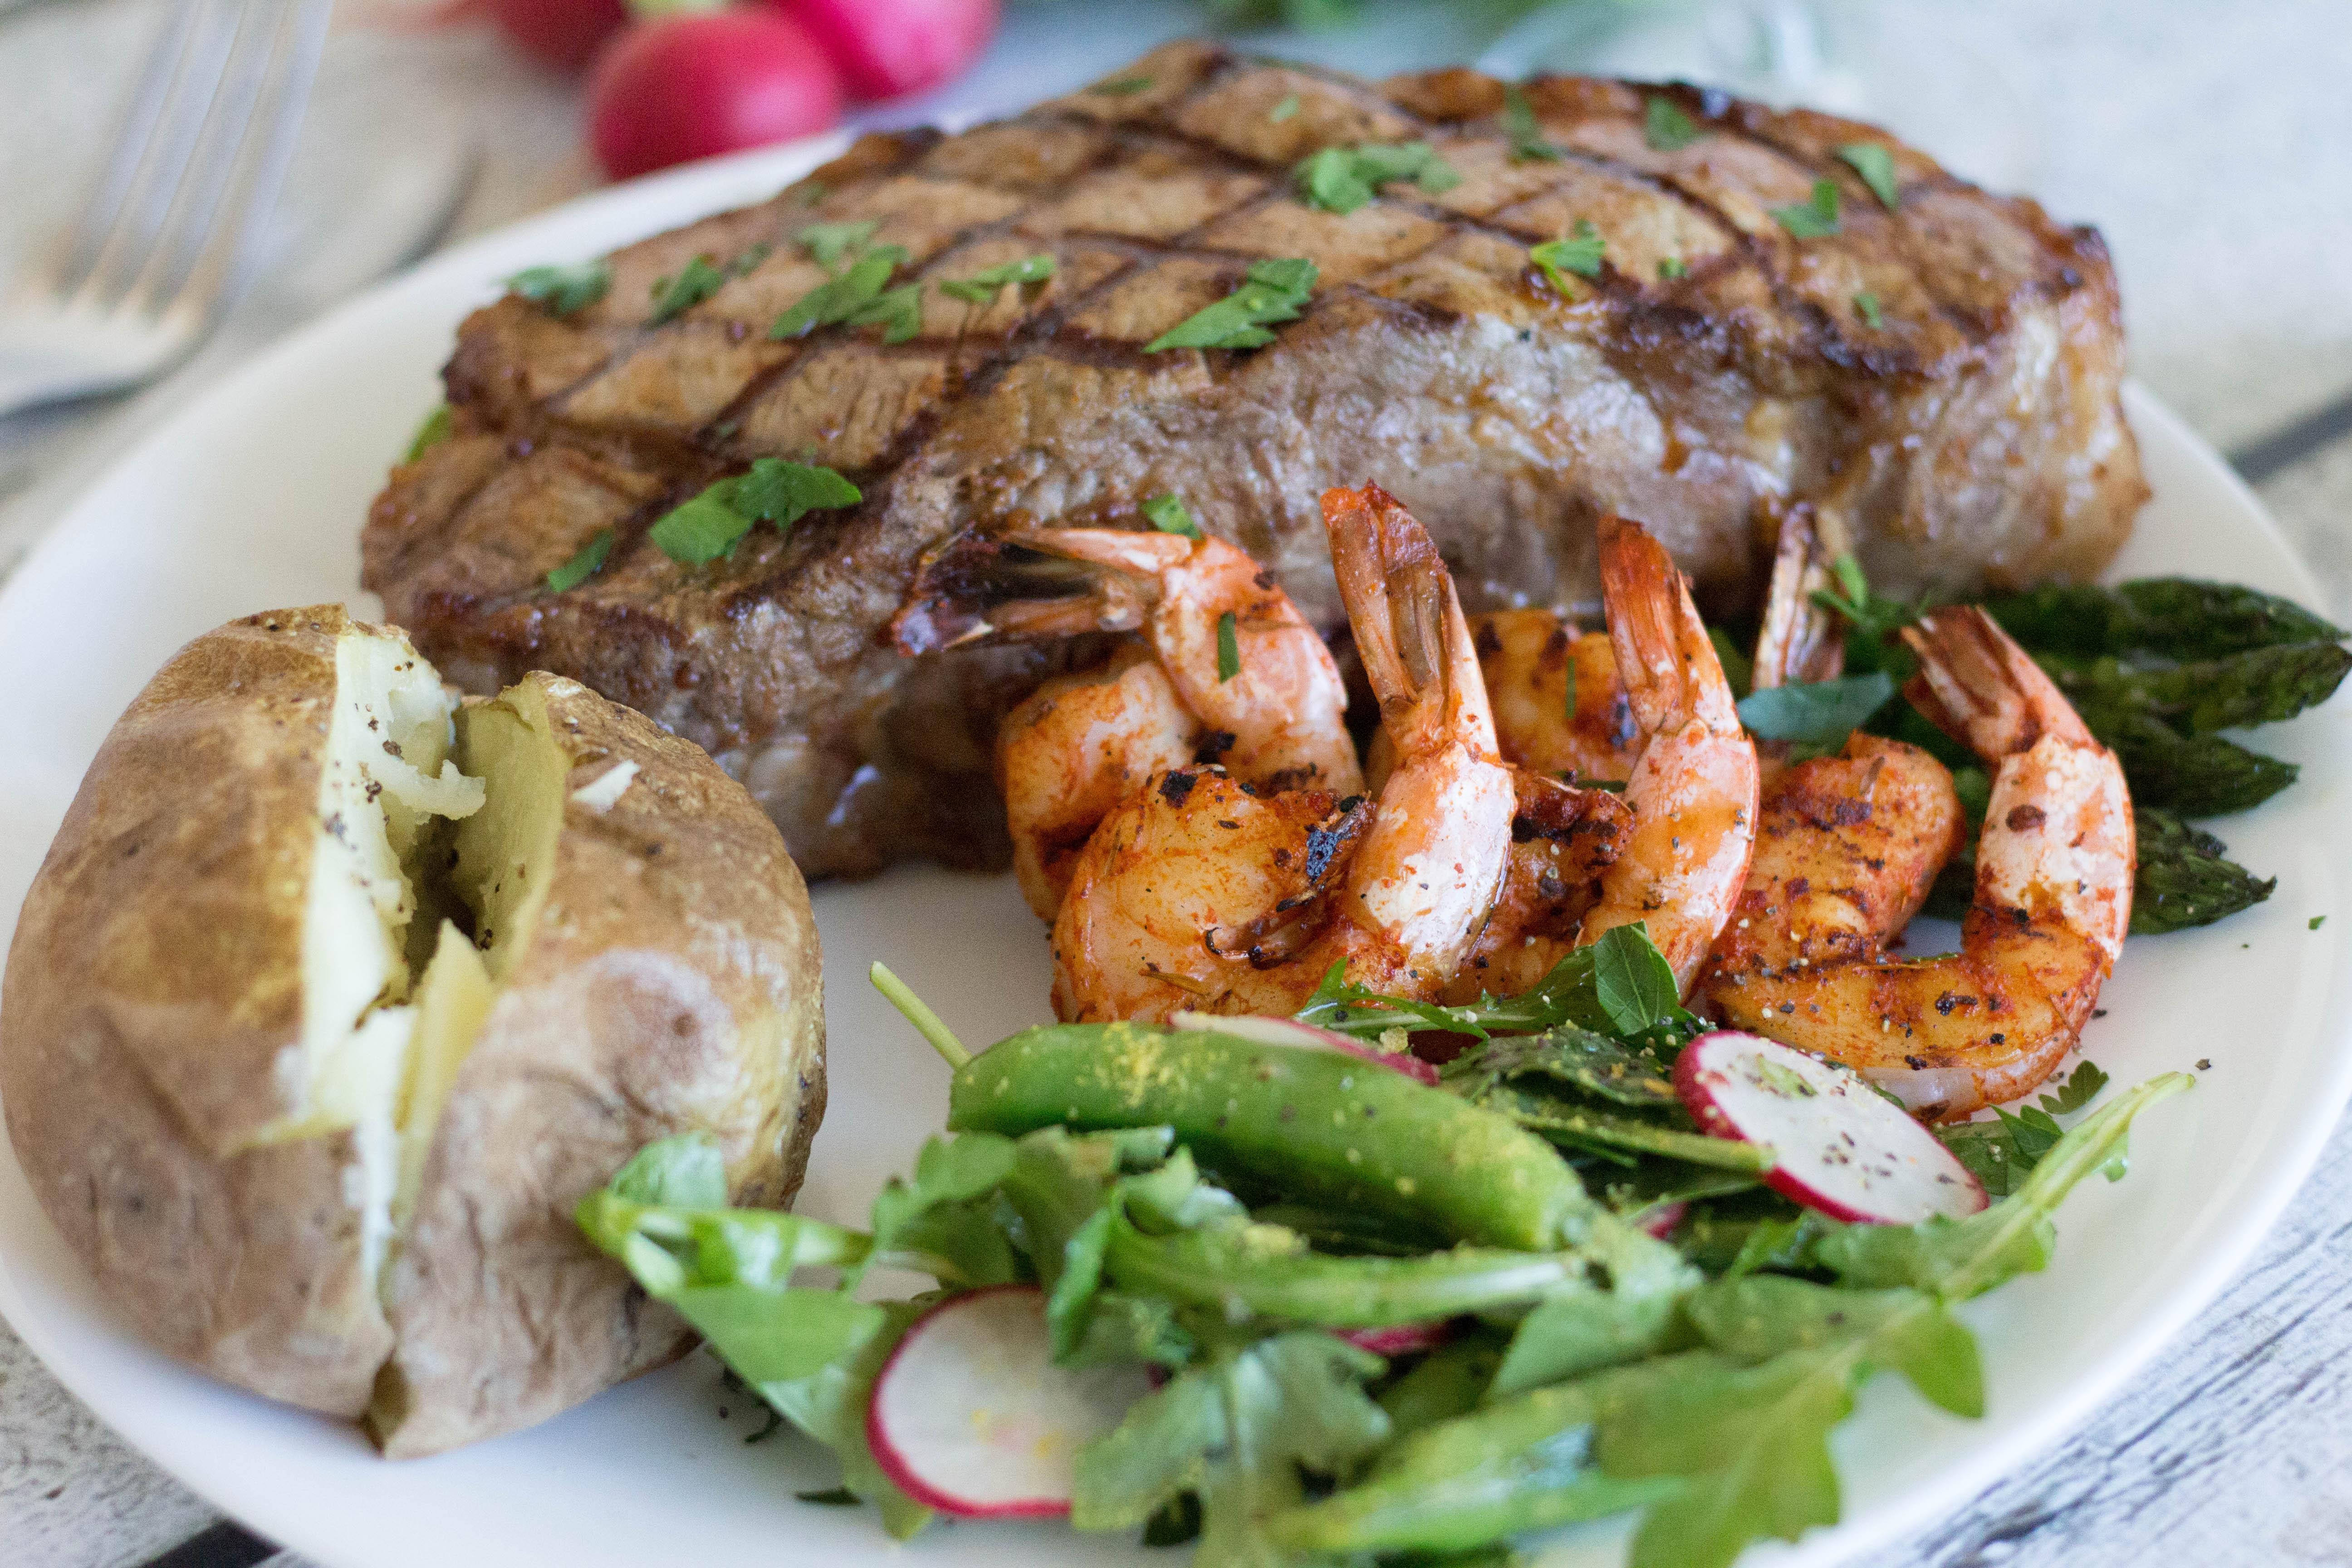 salt pork whole foods - 28 images - curried pork stew with ...